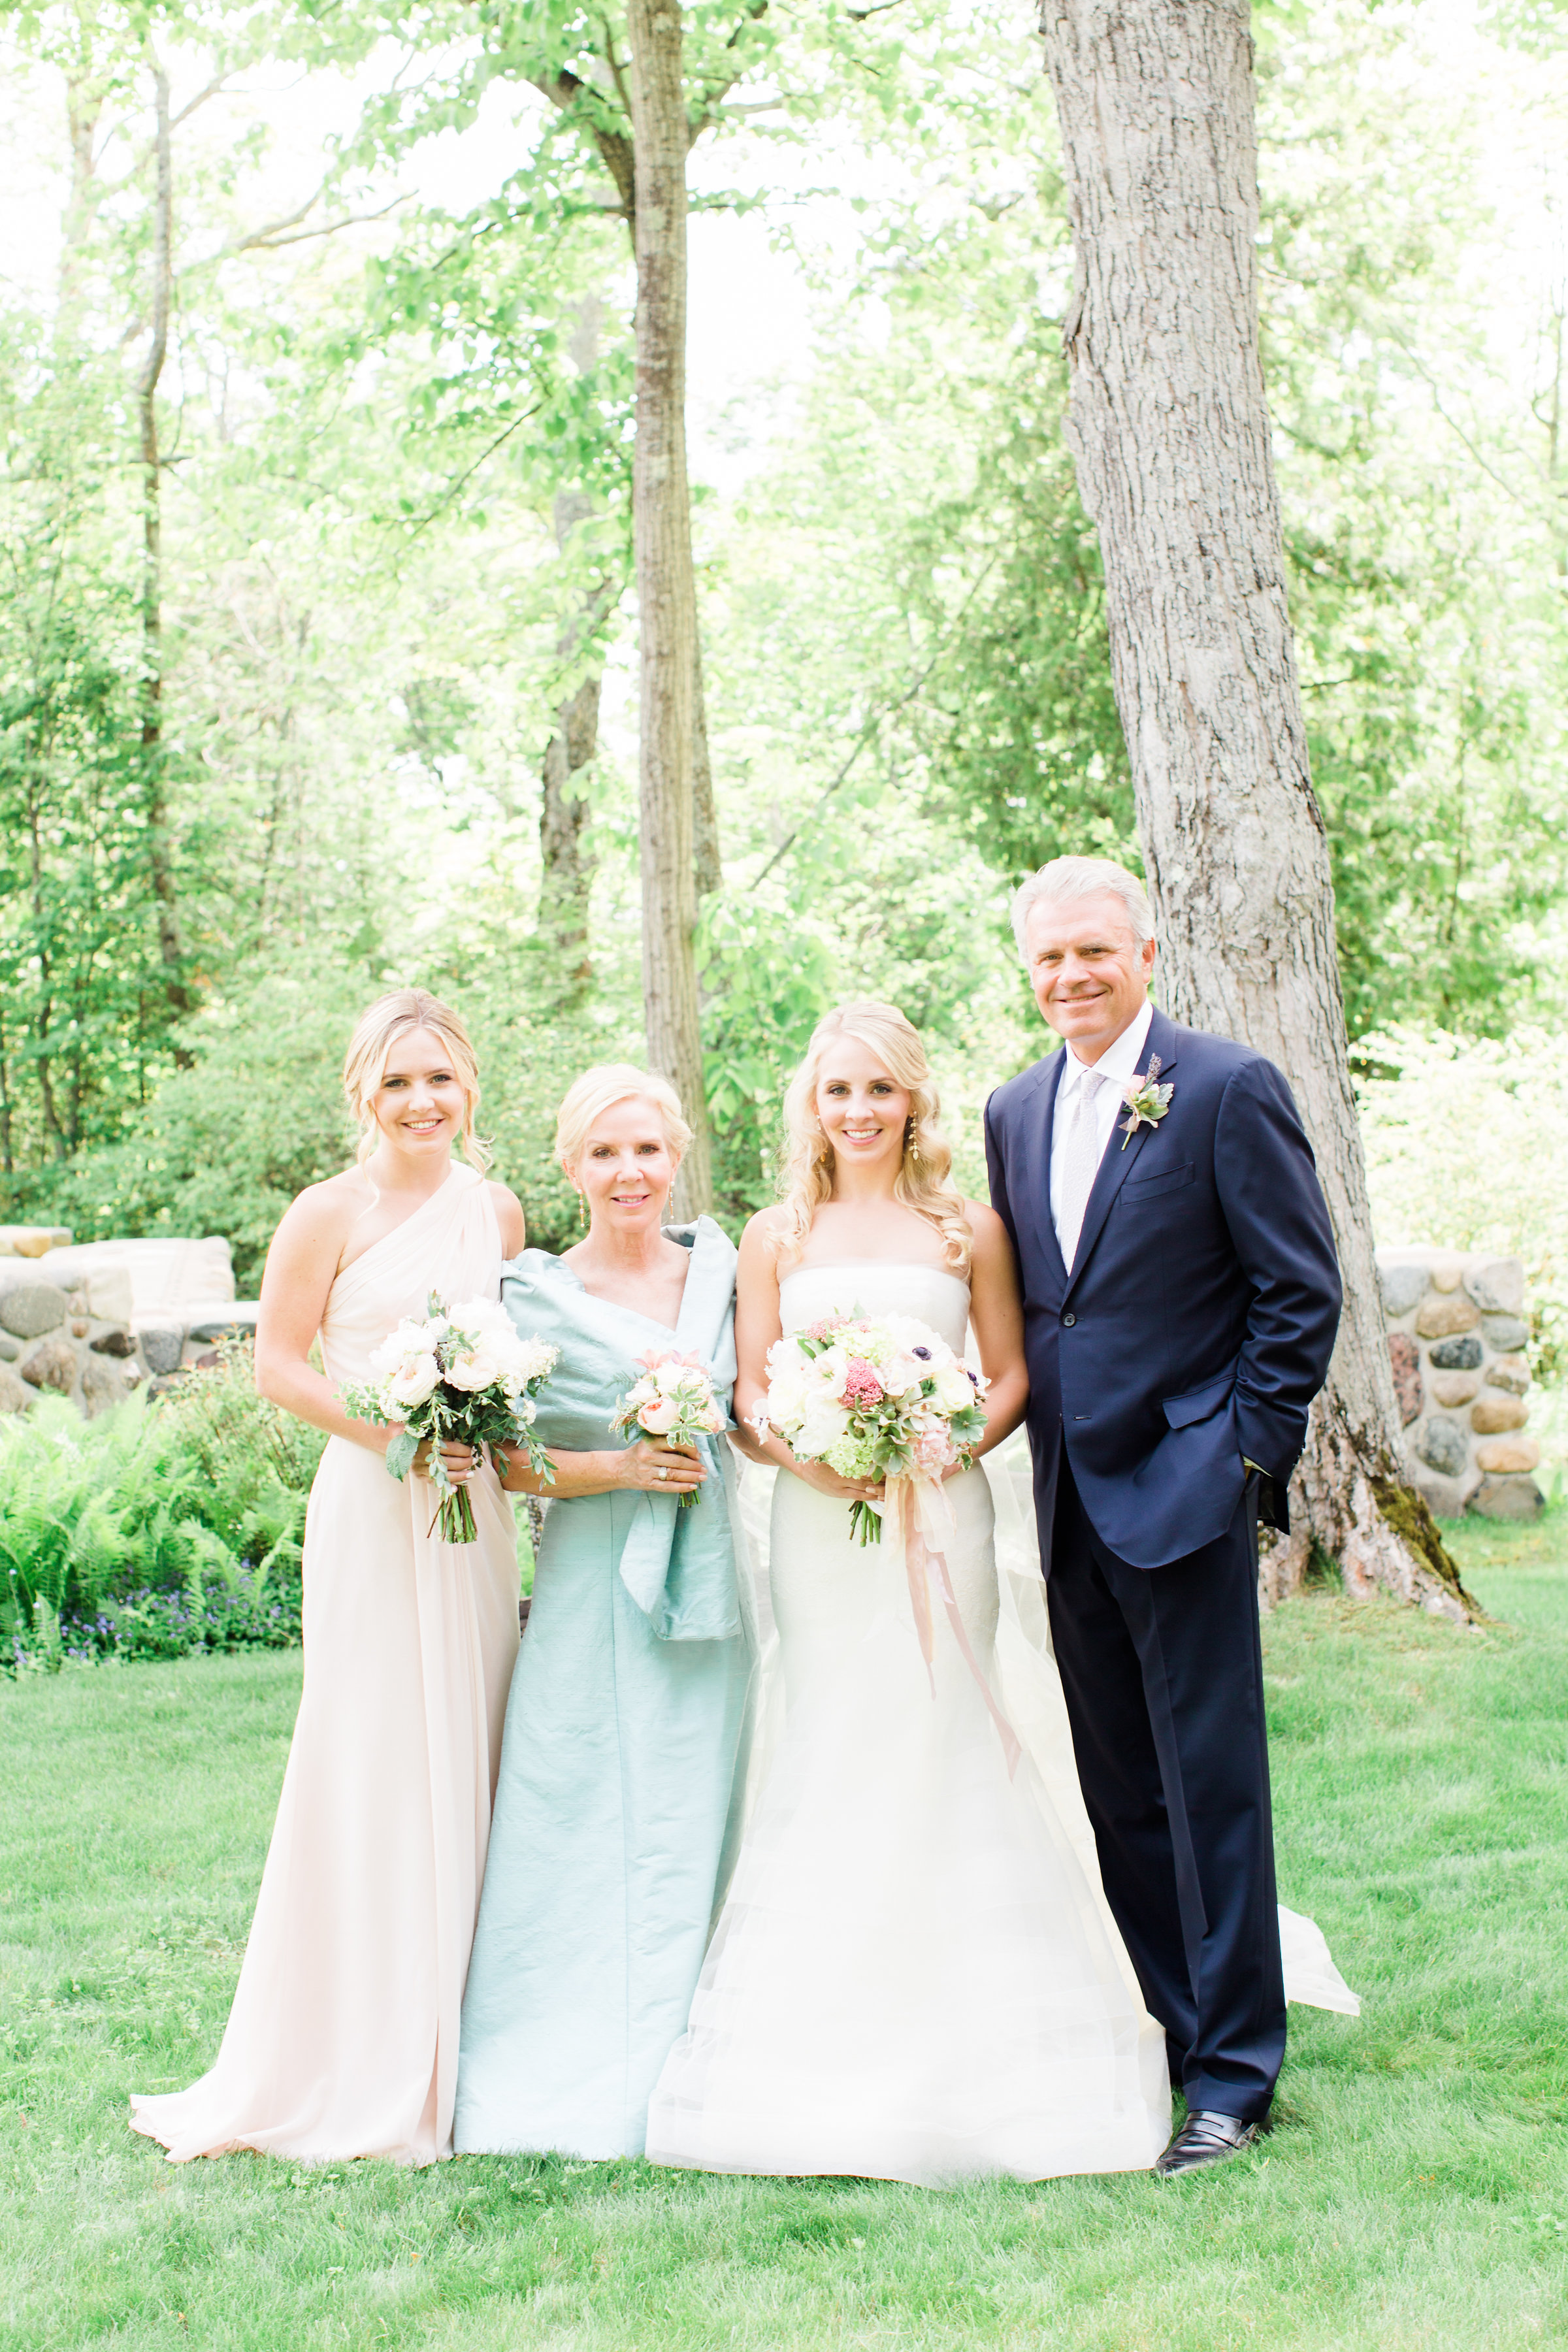 Coffman+Wedding+Familya-7.jpg